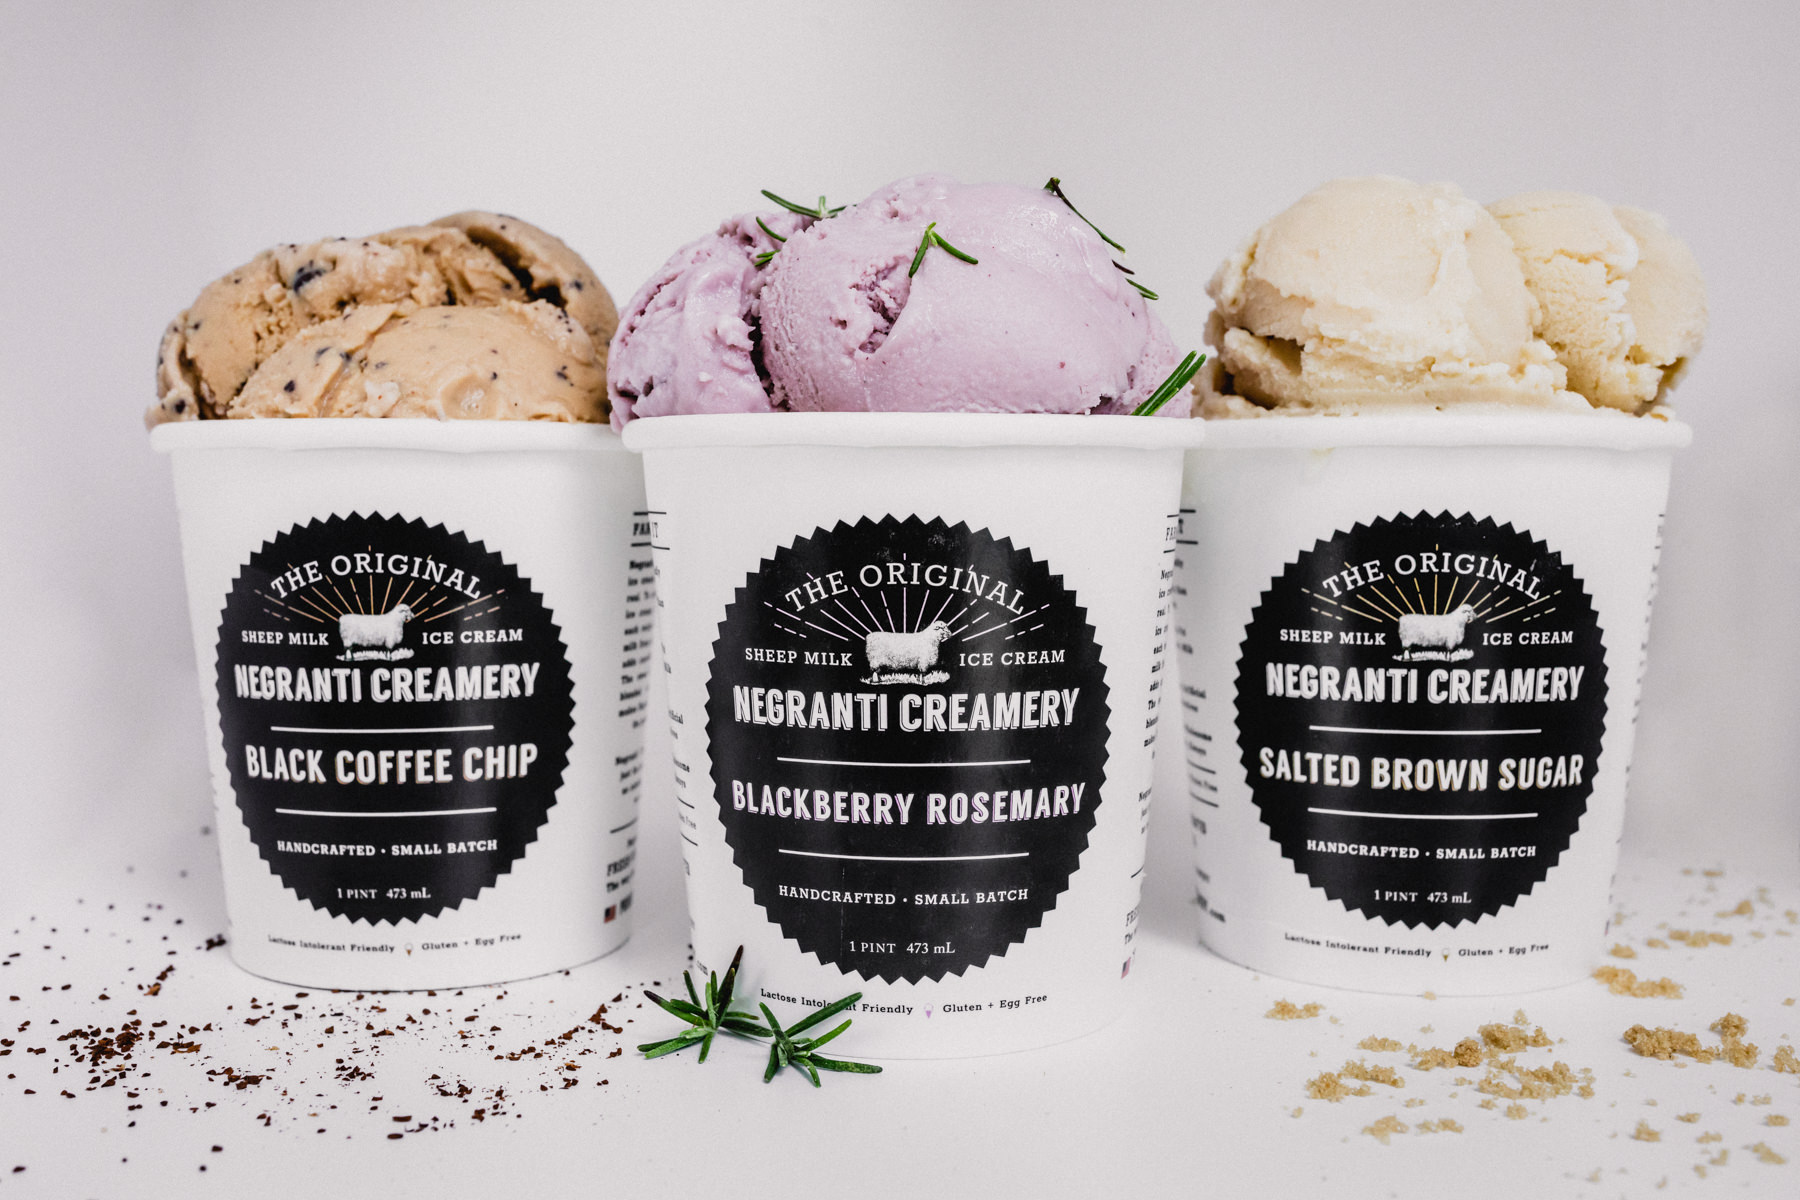 Product-Photography-Negranti-Creamery-Paso-Robles-California-805-Media-17.jpg